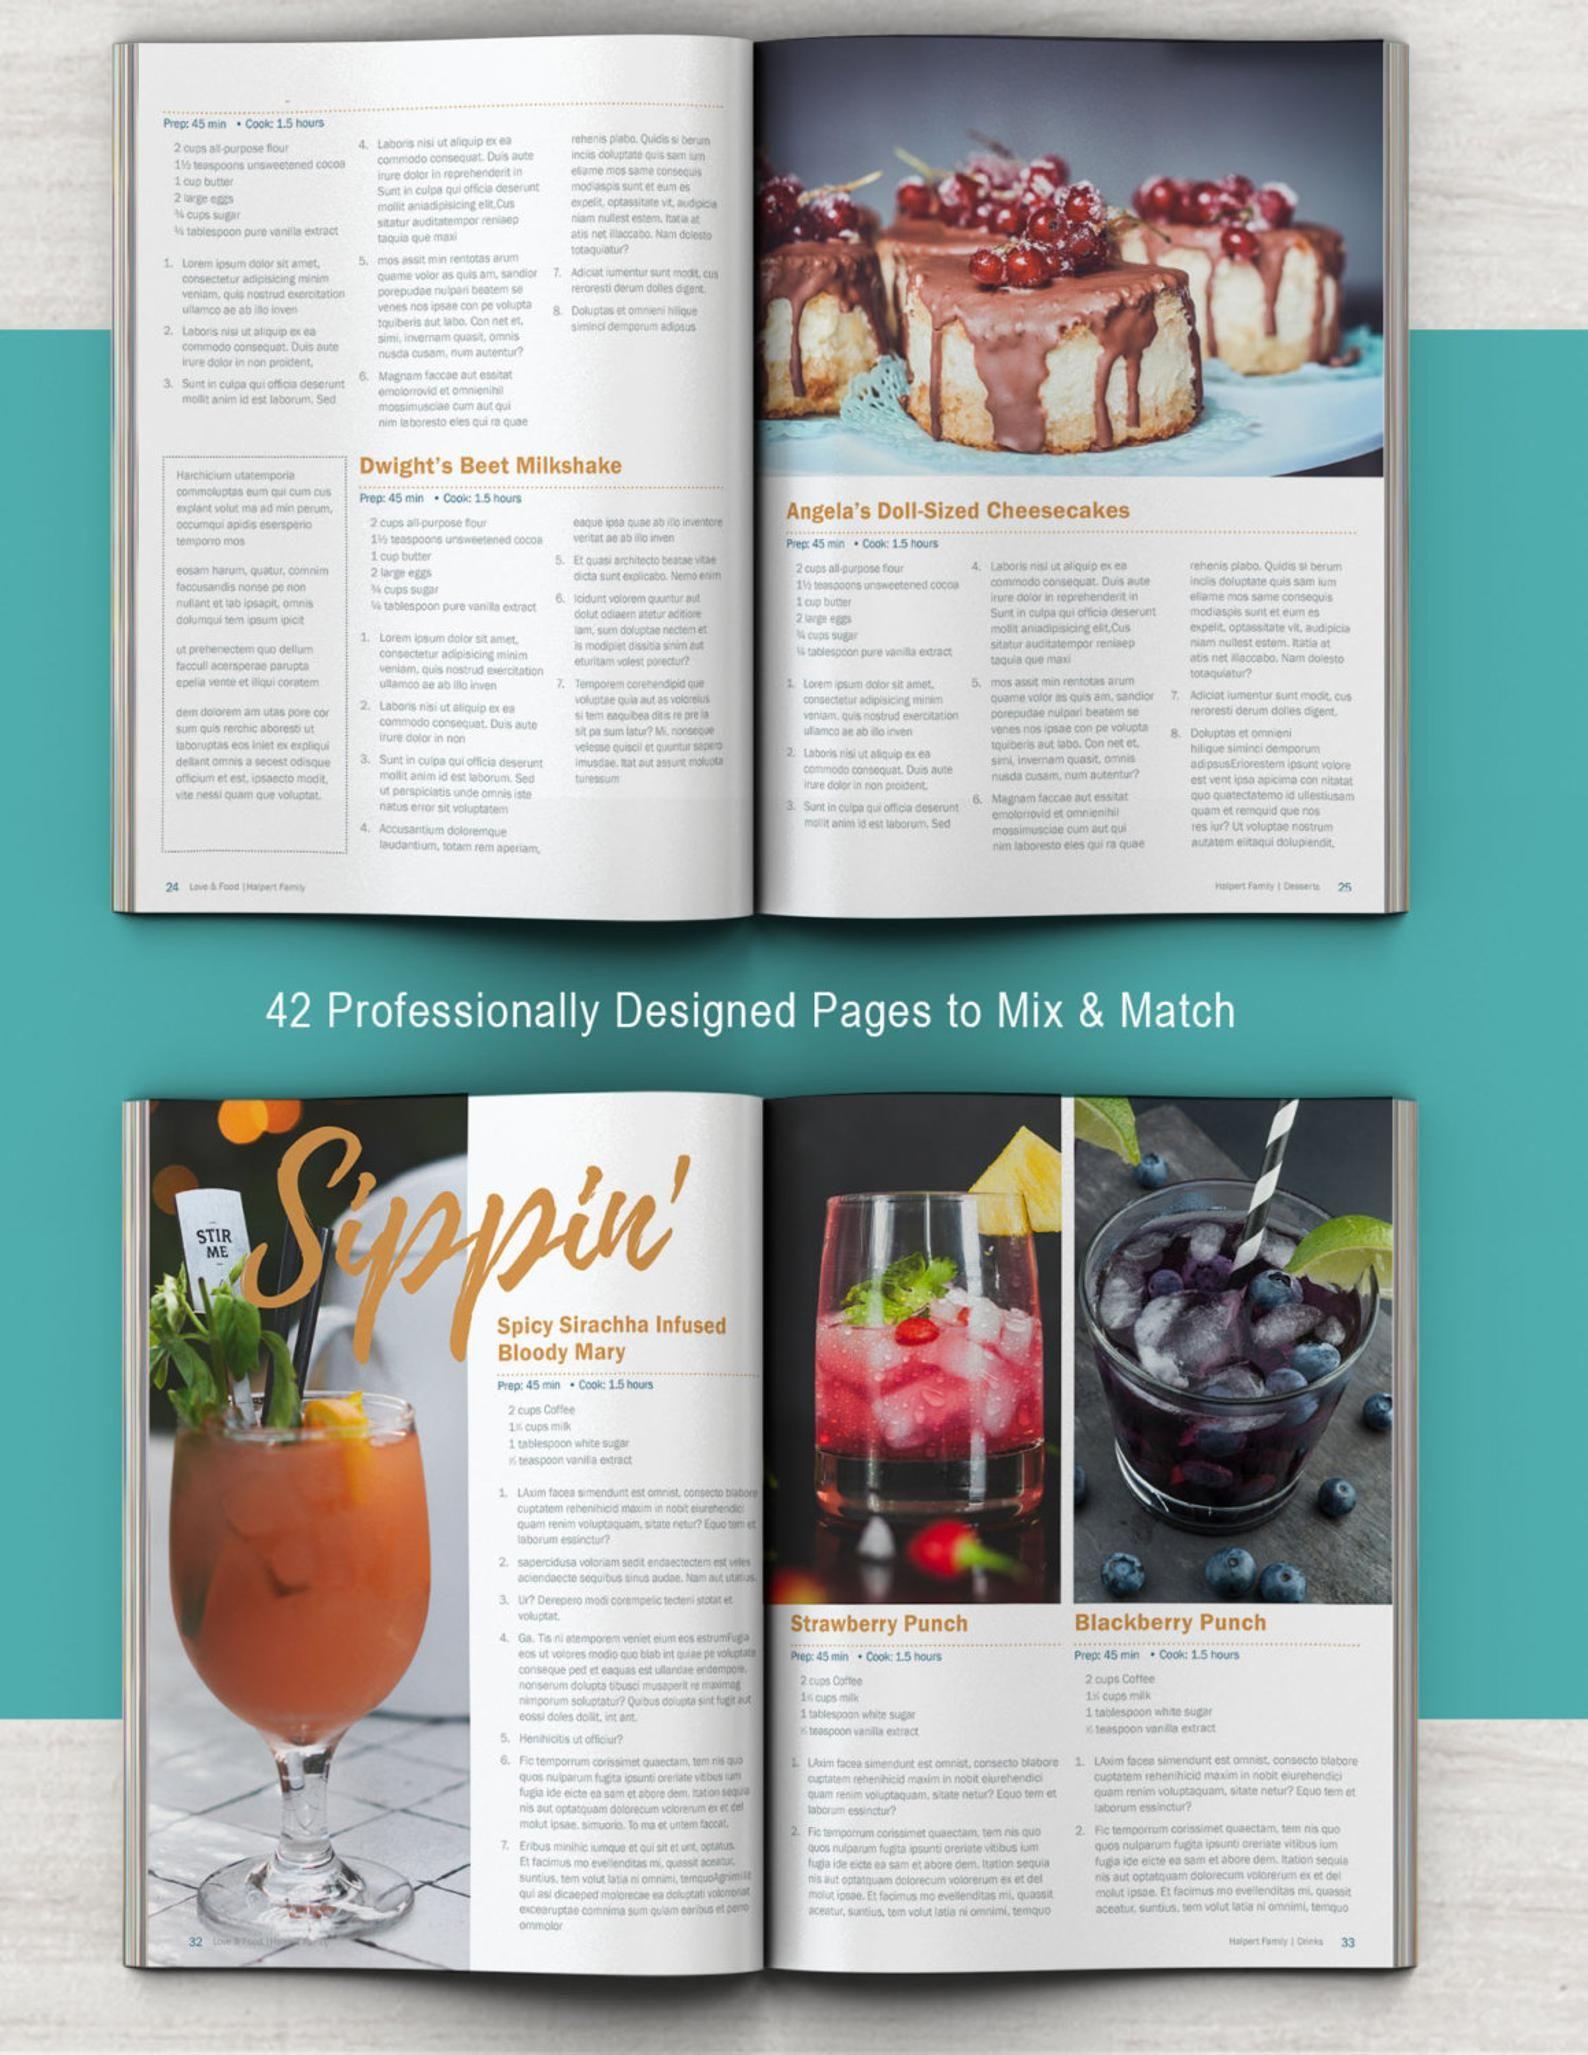 Cookbook And Recipe Template For Adobe Indesign Instant Etsy In 2020 Recipe Template Cookbook Template Cookbook Design